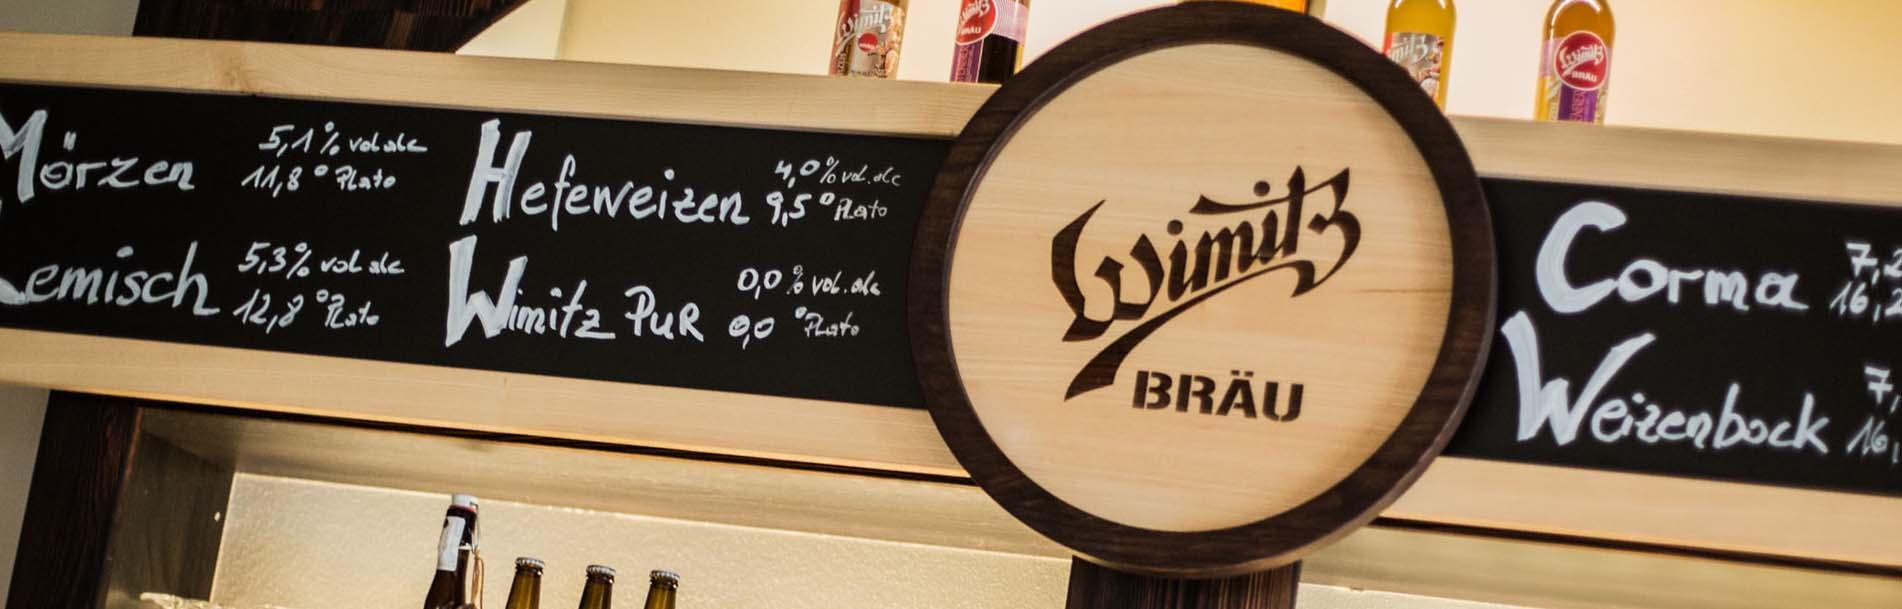 Marktplatz Mittelkaernten Wimitz Braeu | Foto: Fotostudio Linz